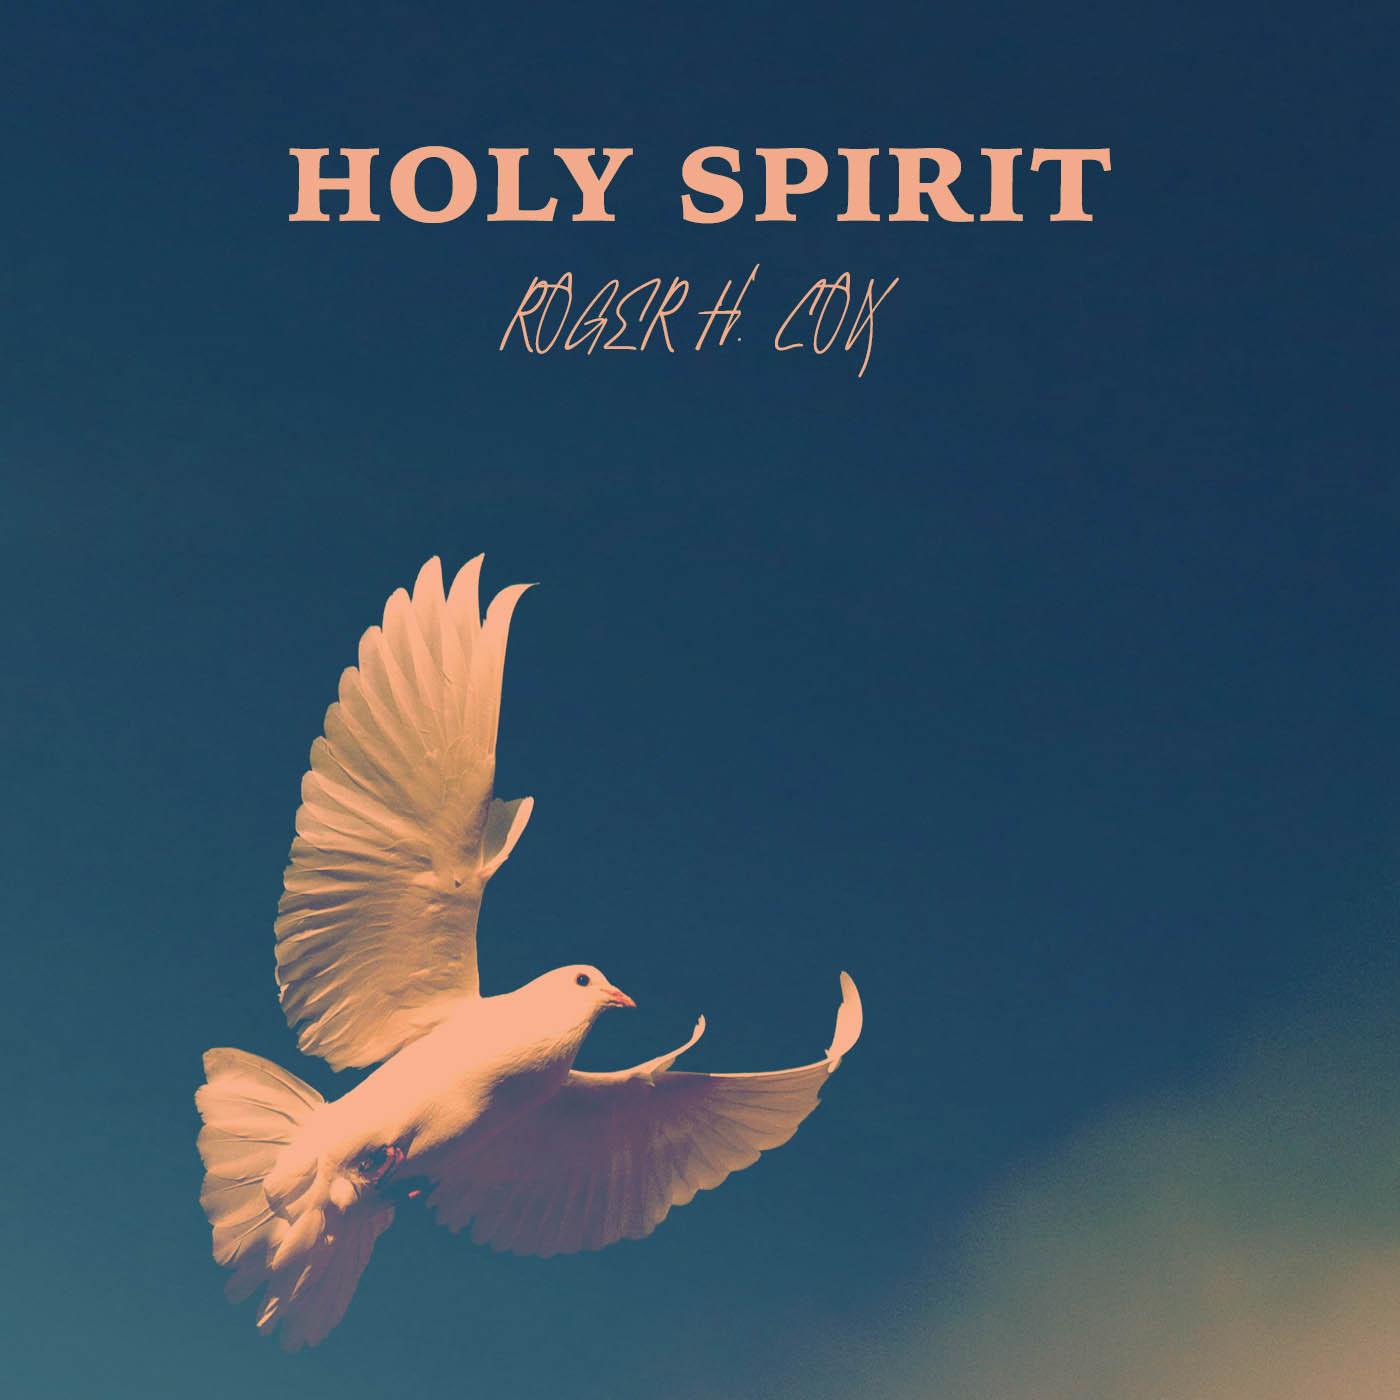 Holy Spirit Roger H. Cox